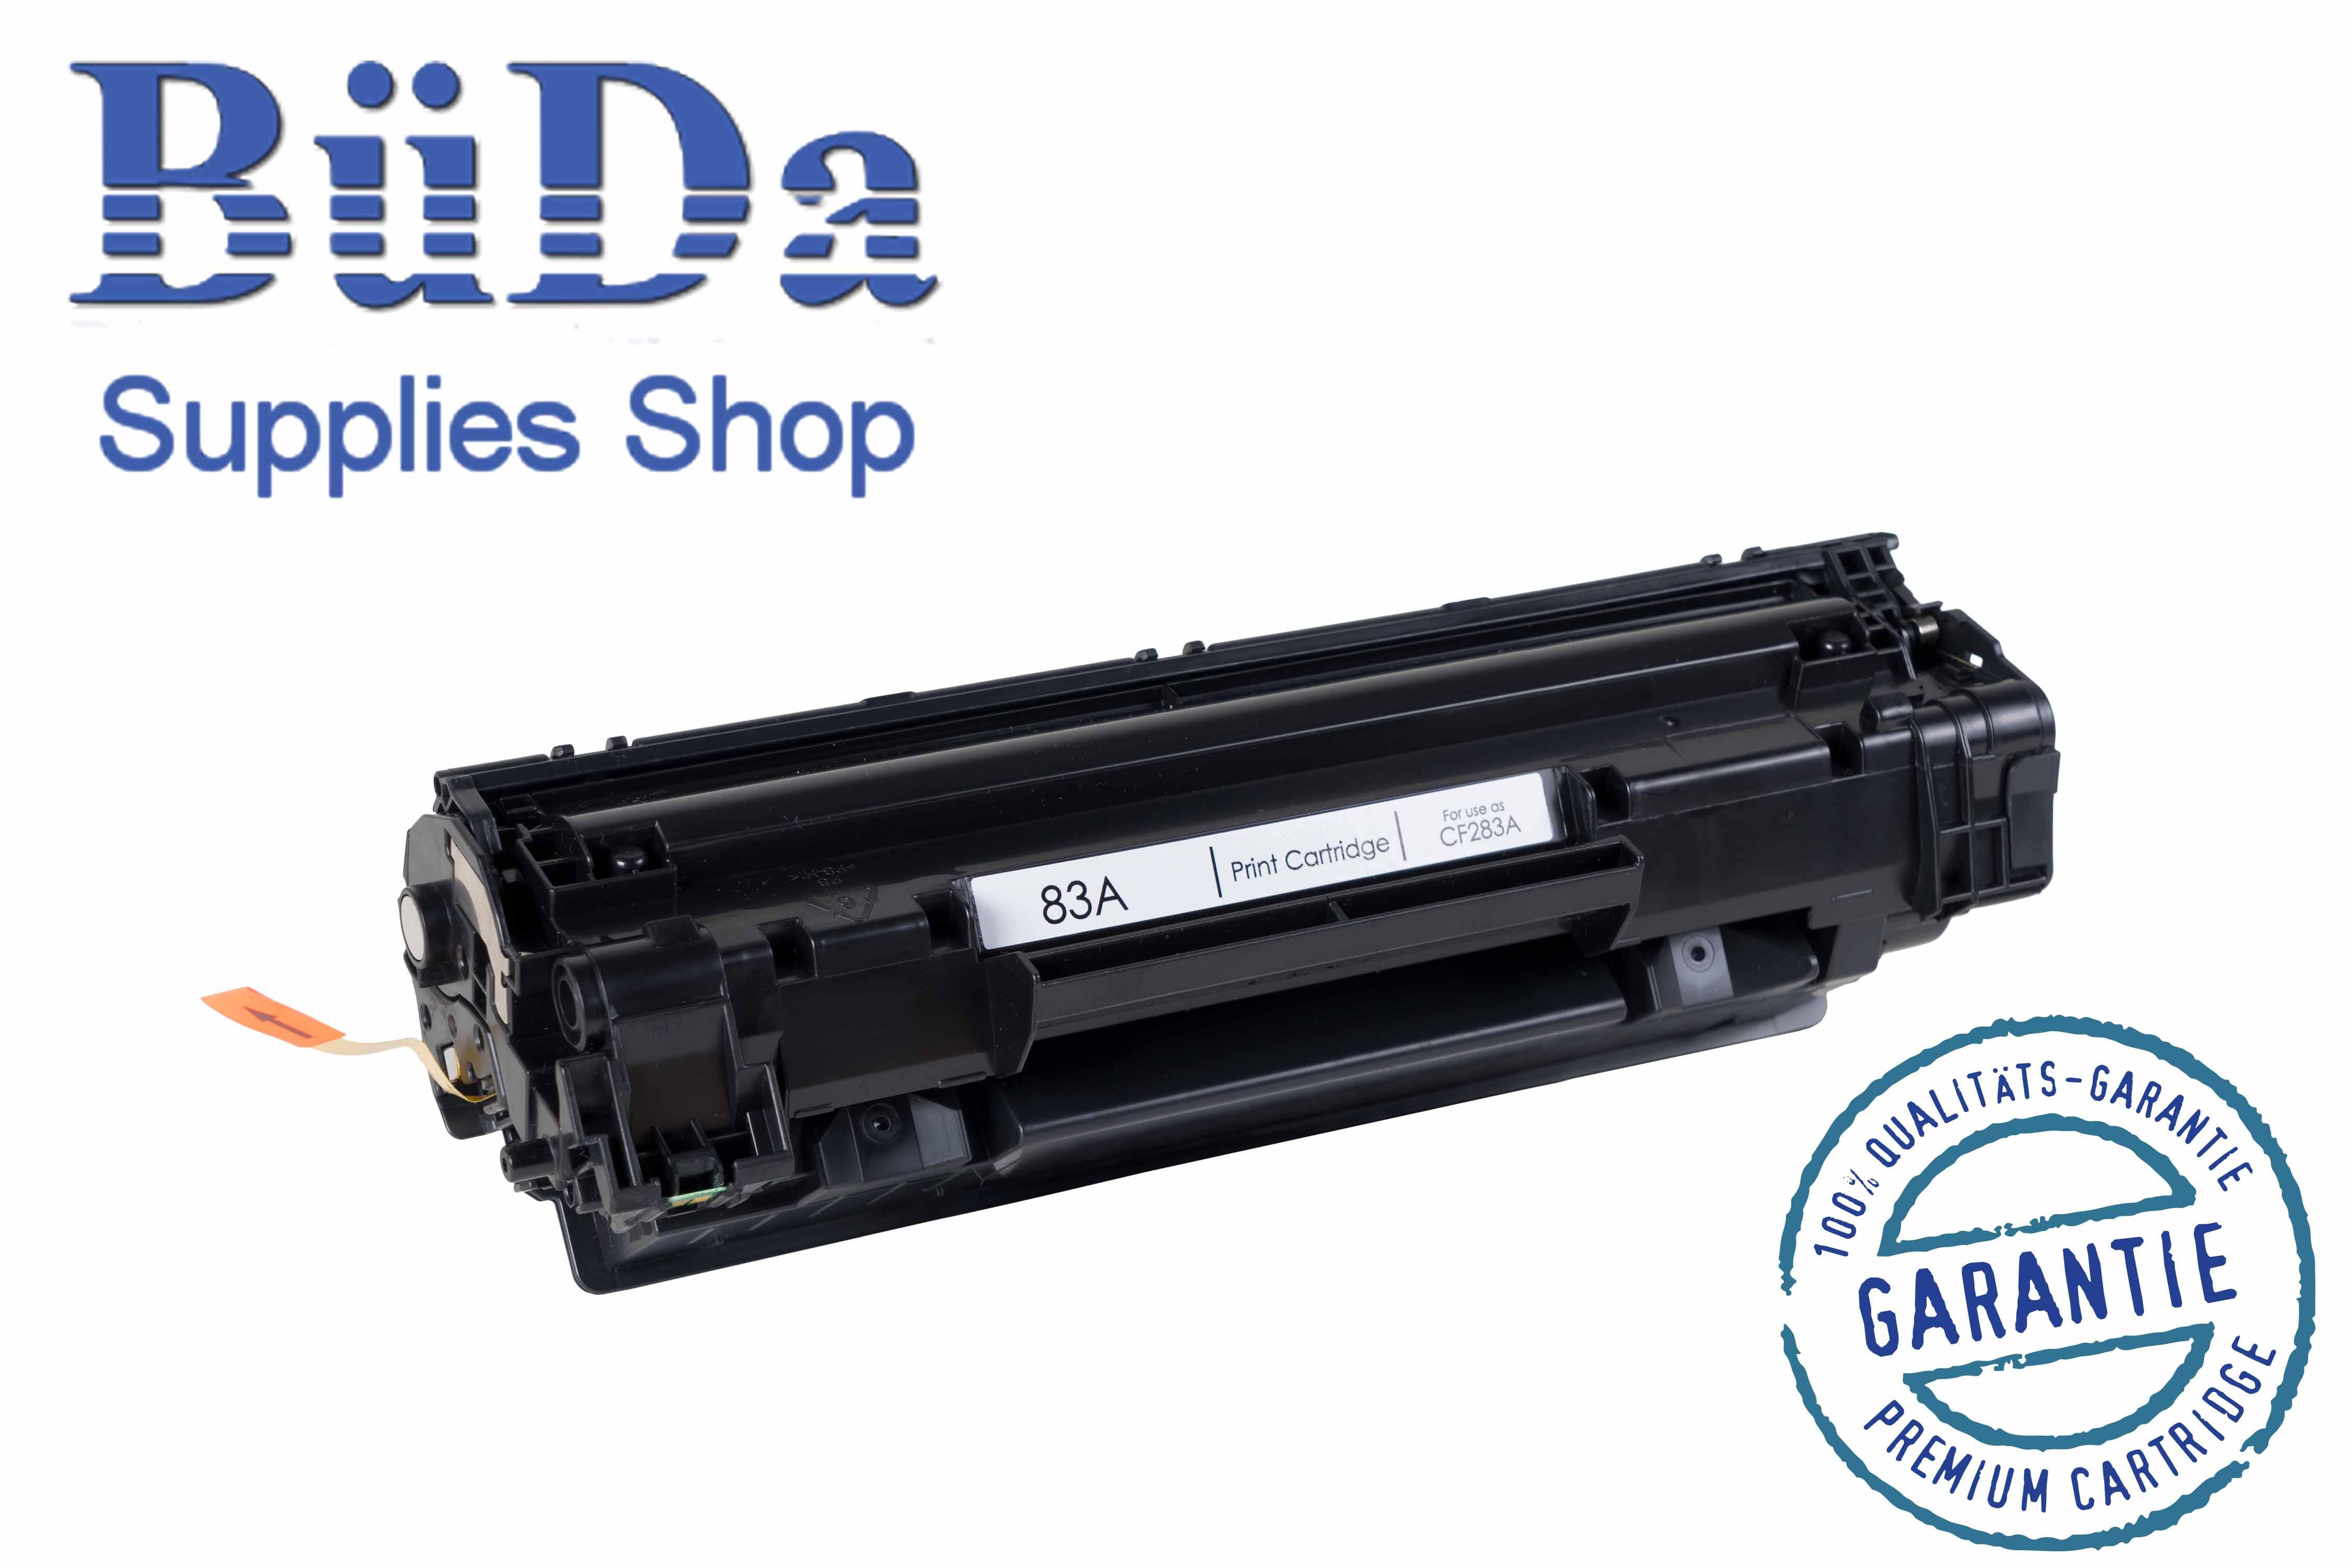 Toner-Modul komp. zu CF283A black 1500 Seiten